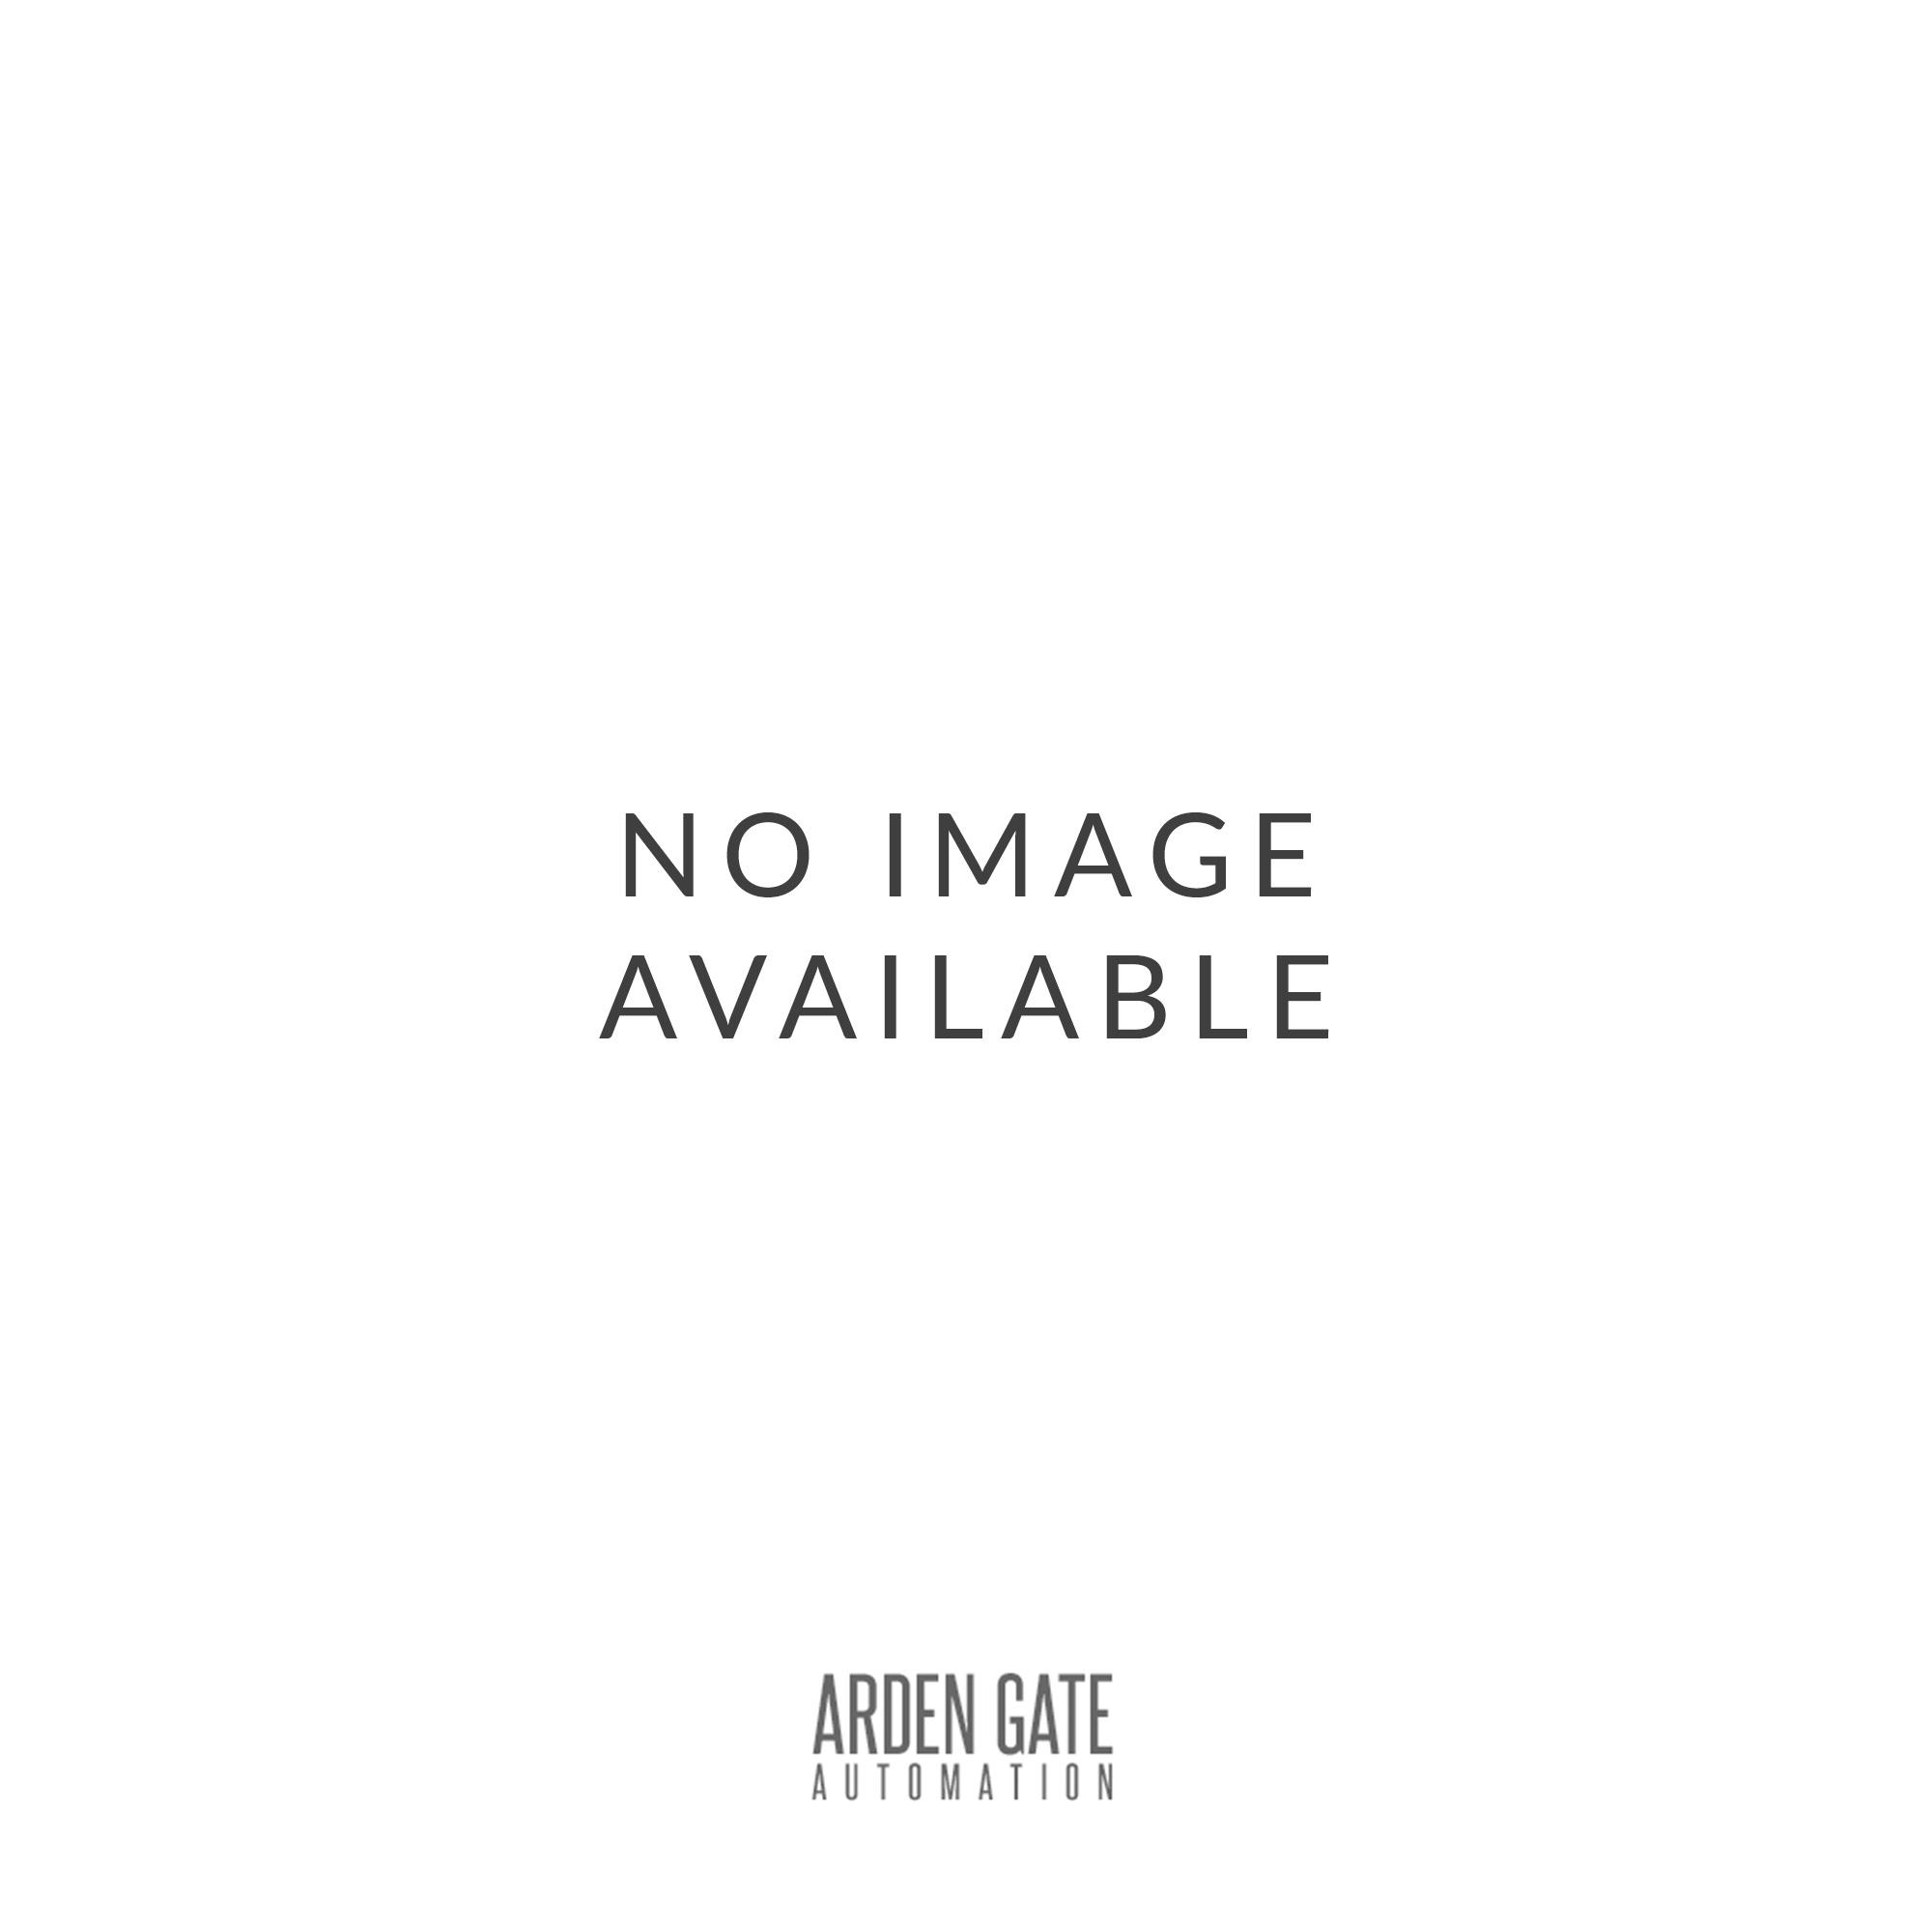 CDVI 12Vdc, 3A Power Supply, Standard Case